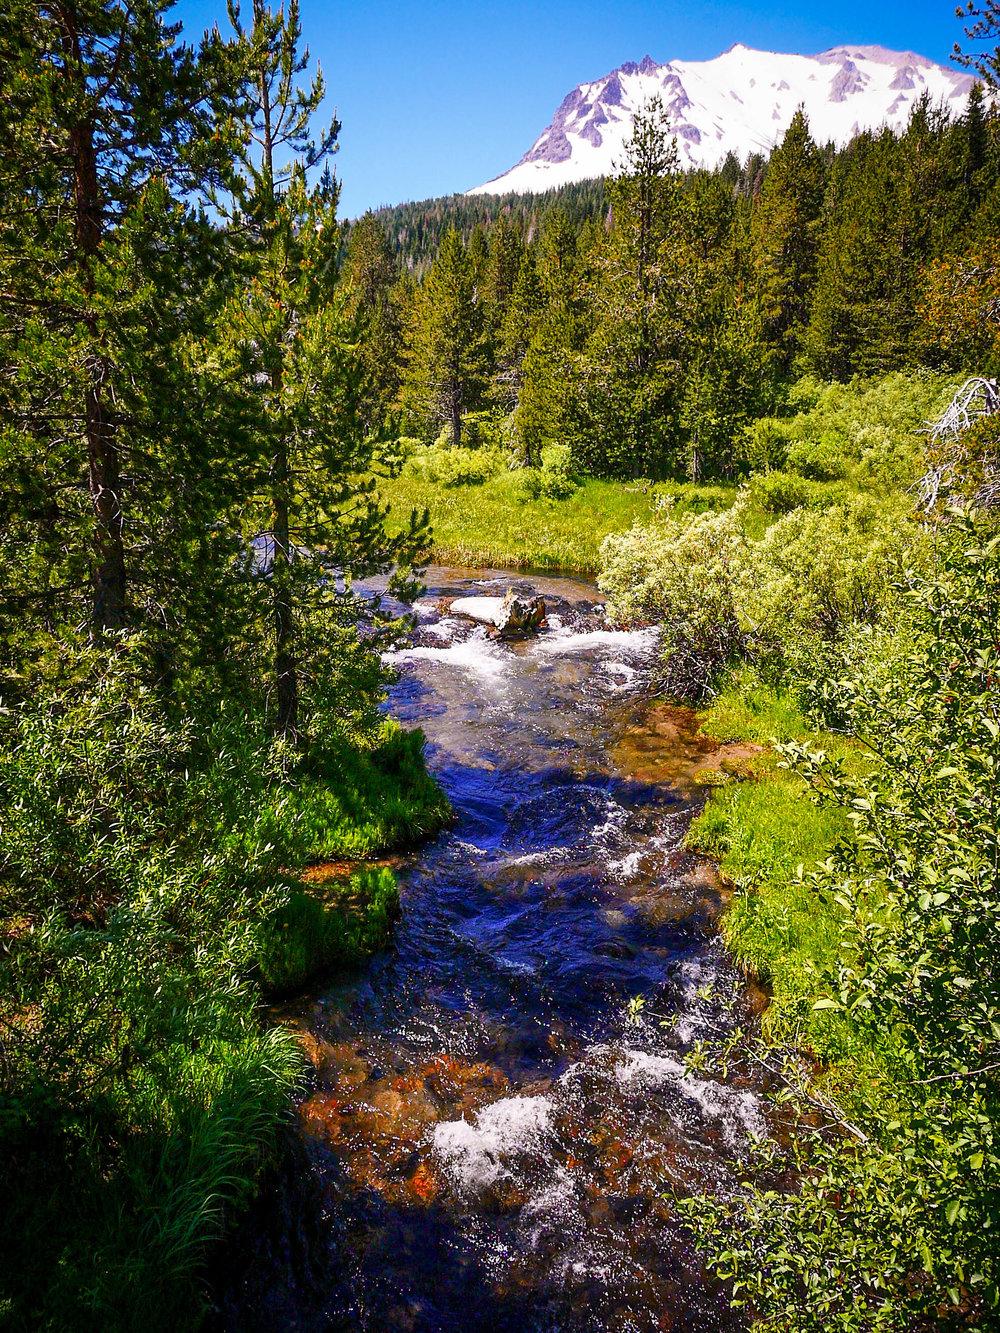 Hat Creek at Lassen Volcanic National Park